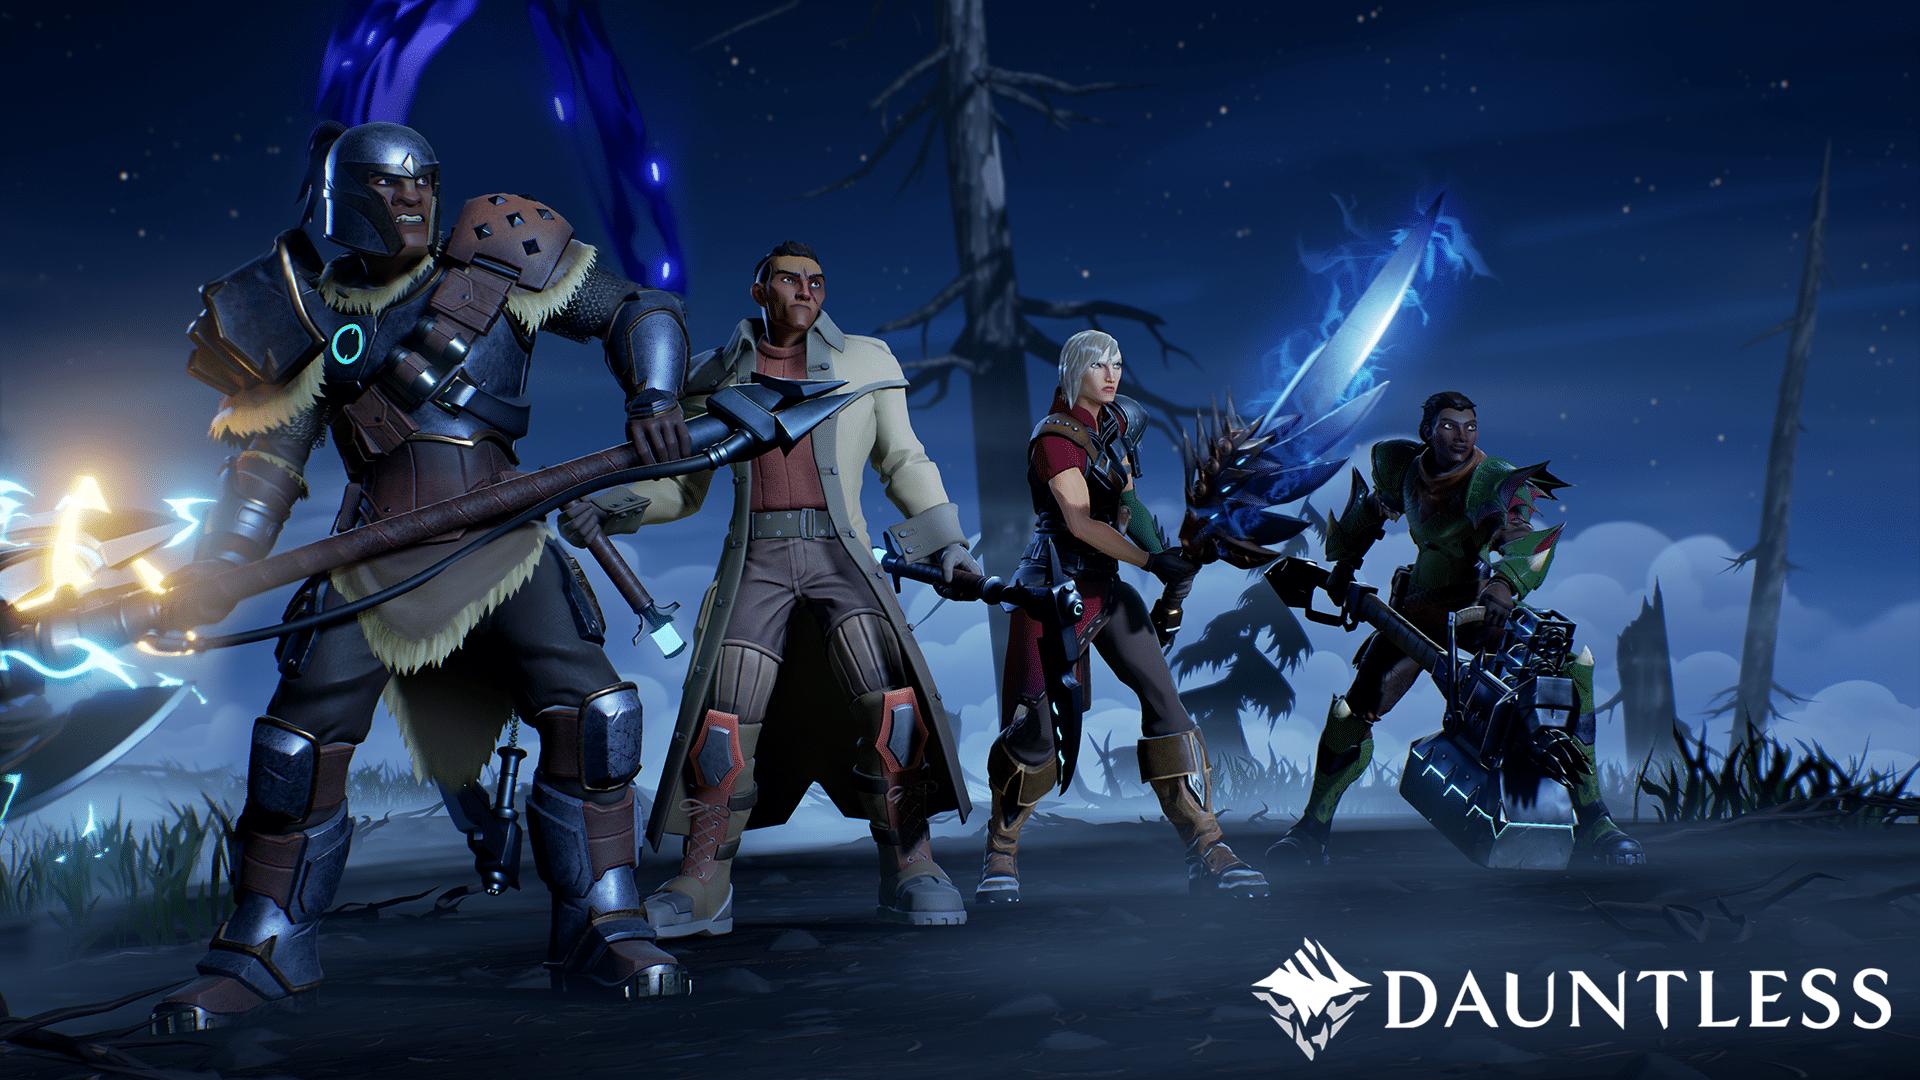 Dauntless Characters & Weapons